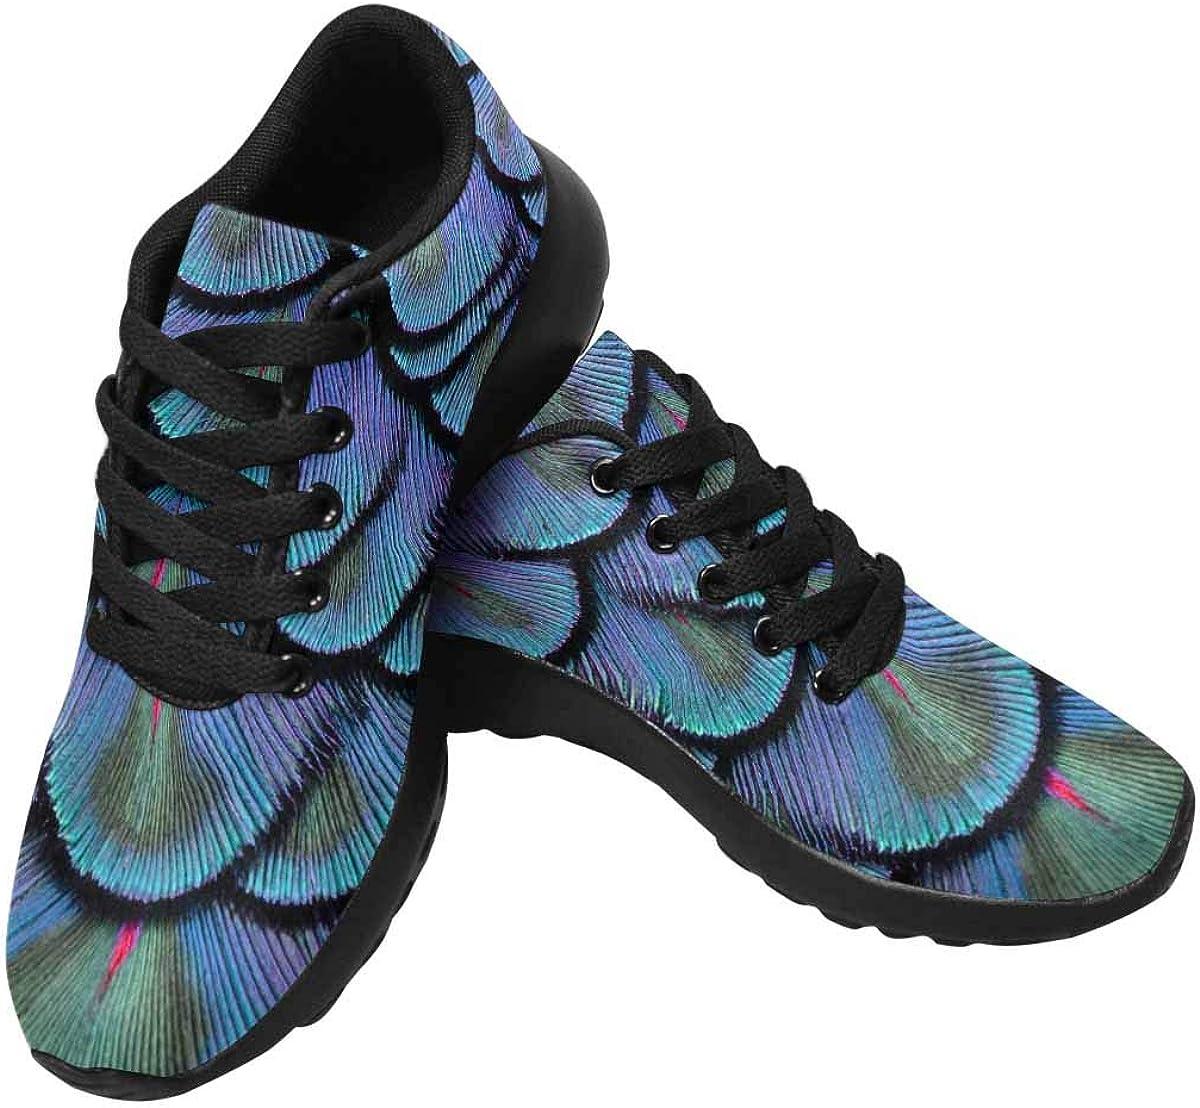 InterestPrint Womens Jogging Sneakers Outdoor Sport Cross Traini